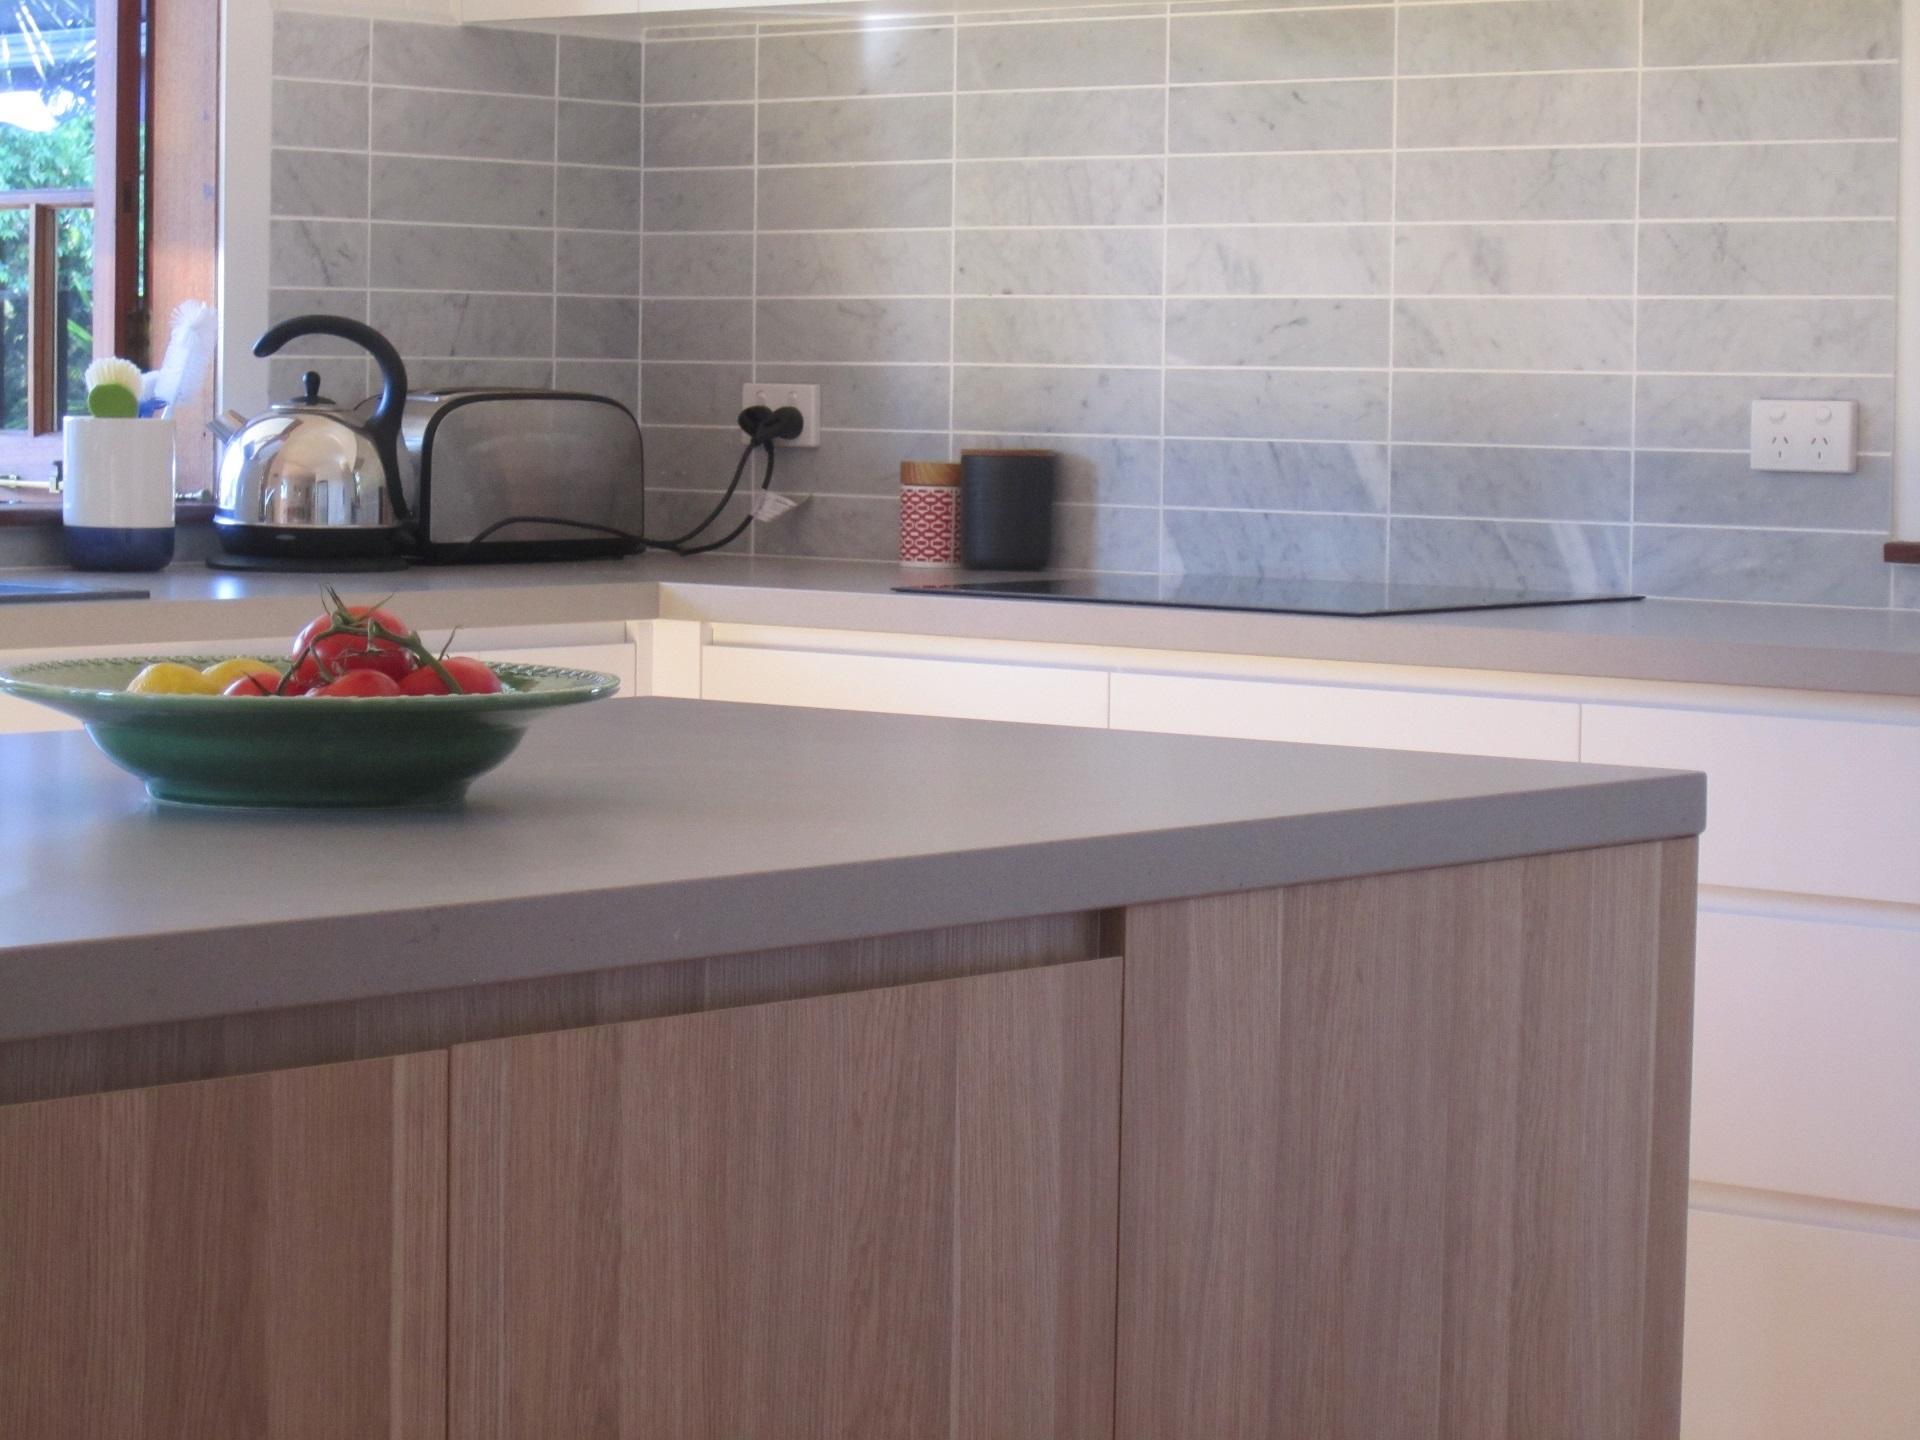 Brisbane Kitchen Design Sherwood Contemporary Kitchen Caesarstone Raw Concrete Timbergrain Laminate 2